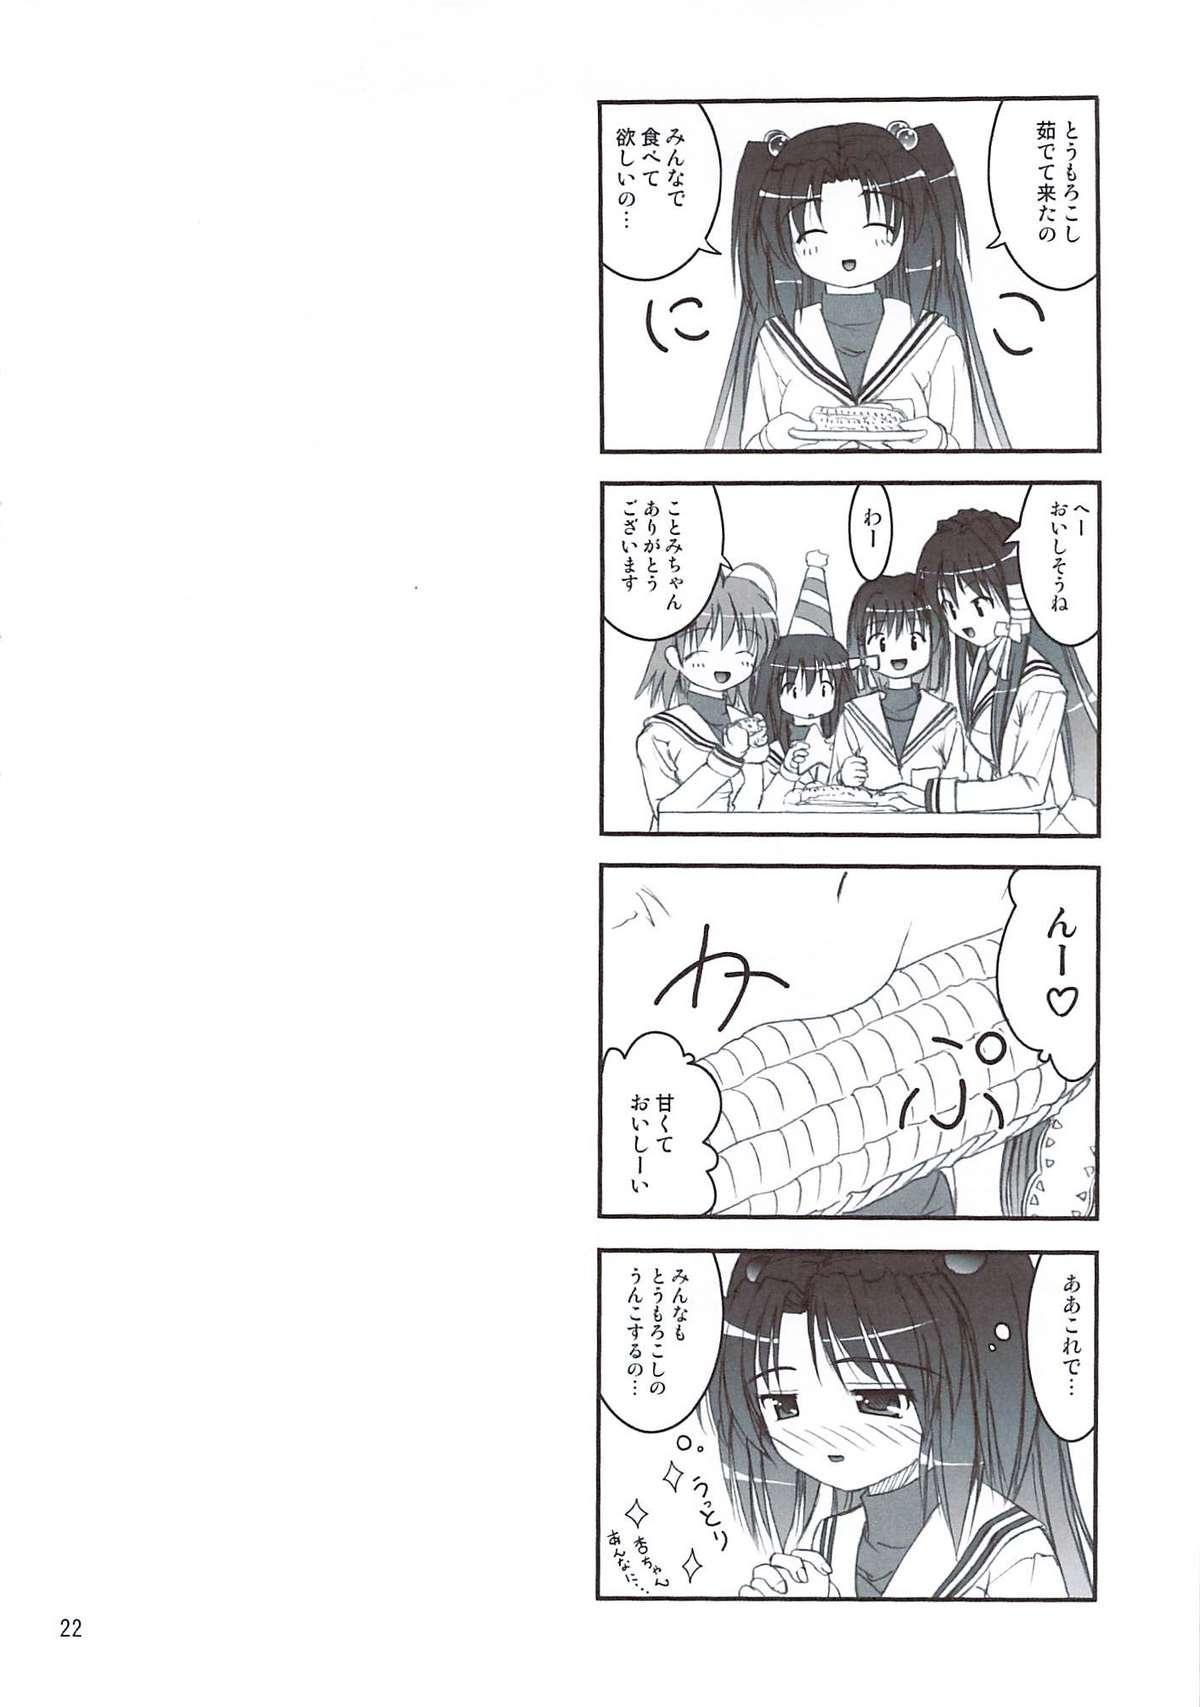 Bou Yuumei Koukou Joshi Toilet Tousatsu 2-jigen Bishoujo Hen Vol. 4 20